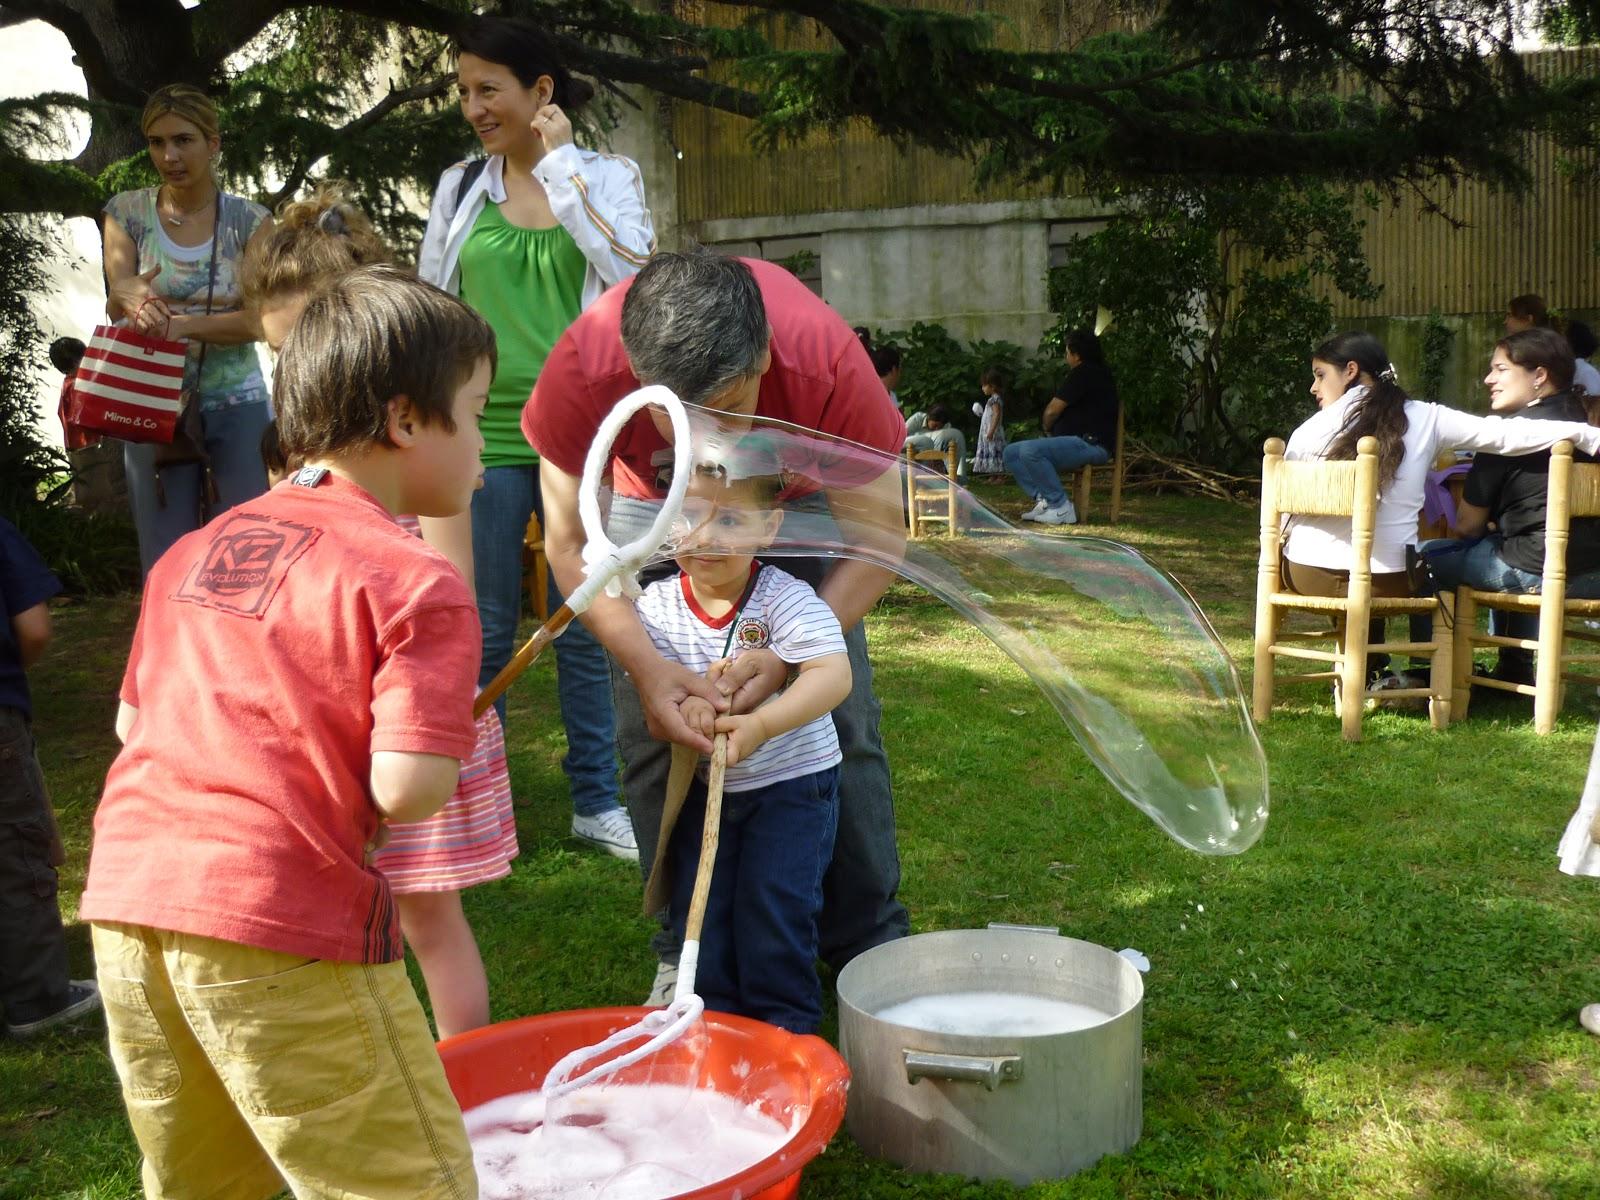 Jardin de gimawari pedagog a waldorf gran kermesse en for El jardin gris juego